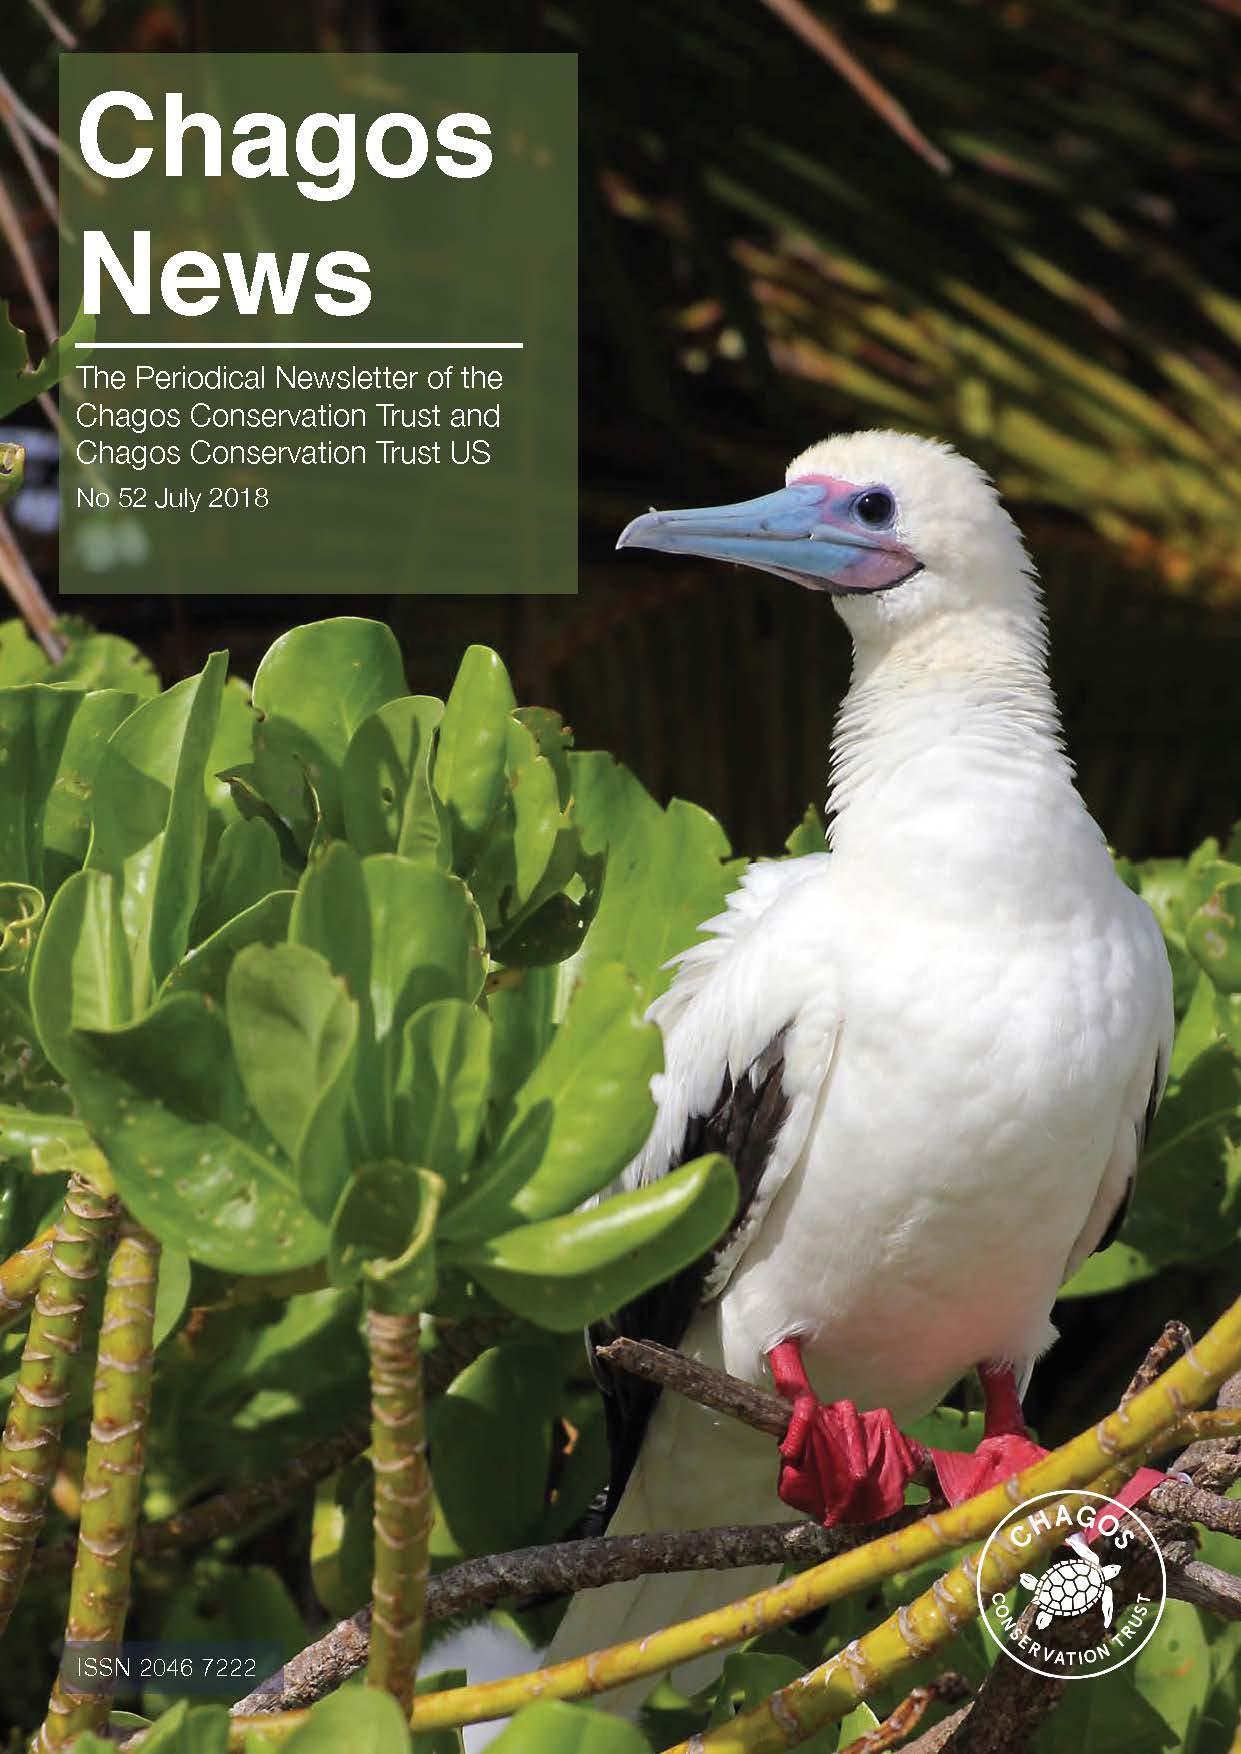 Chagos News issue #52